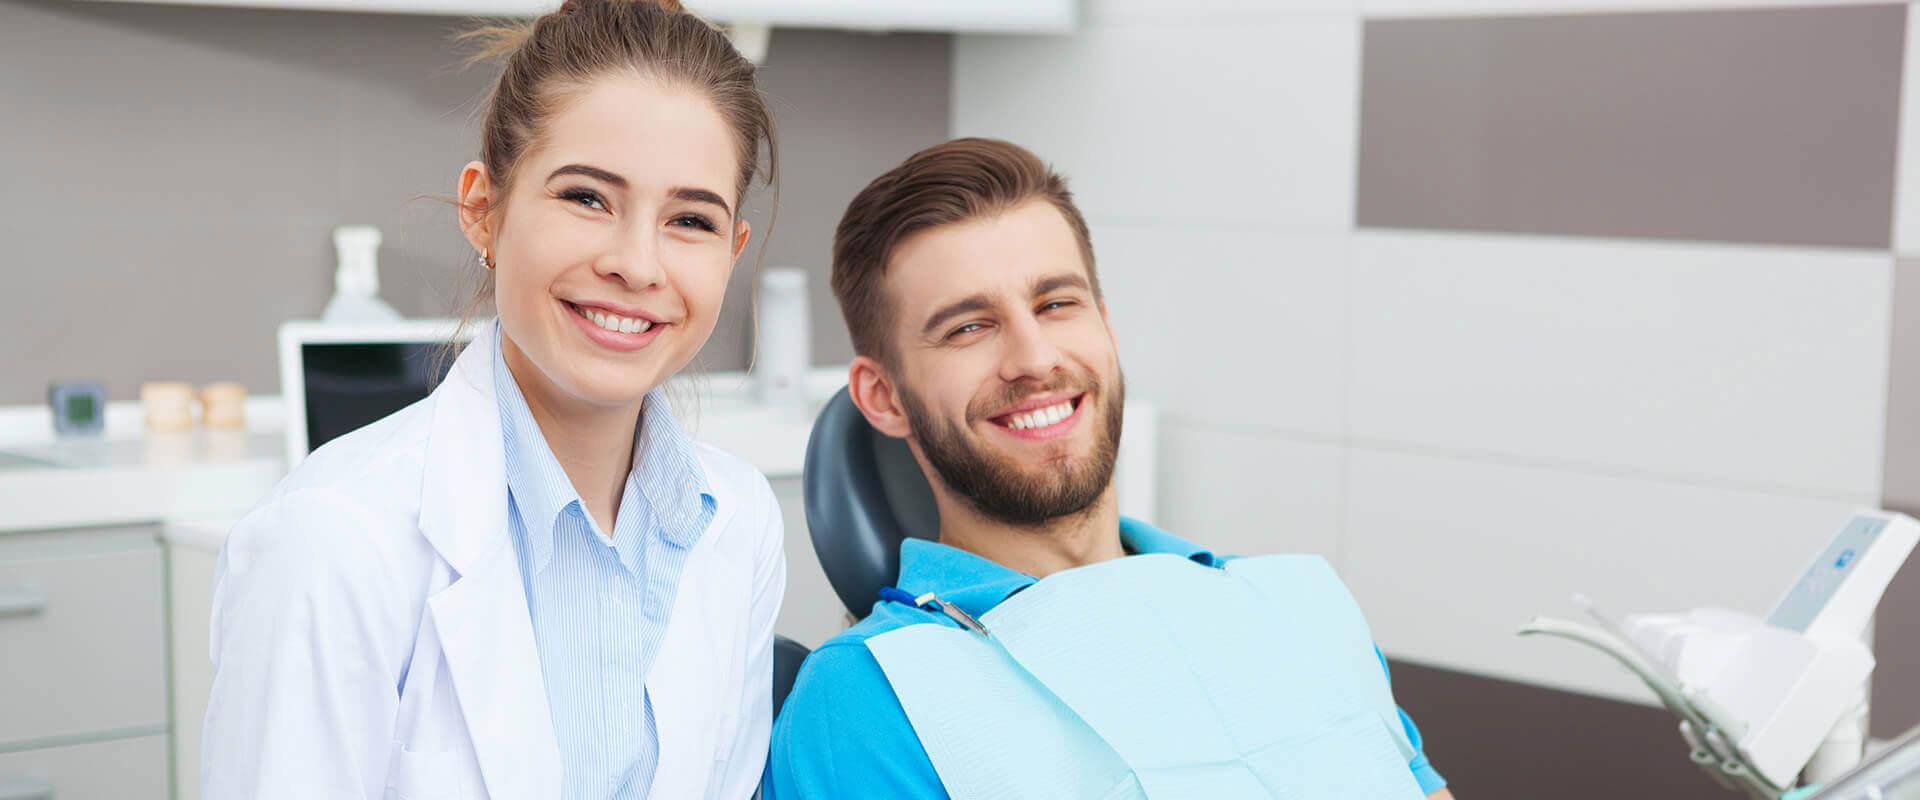 Flourish Your Smile with Fluoride